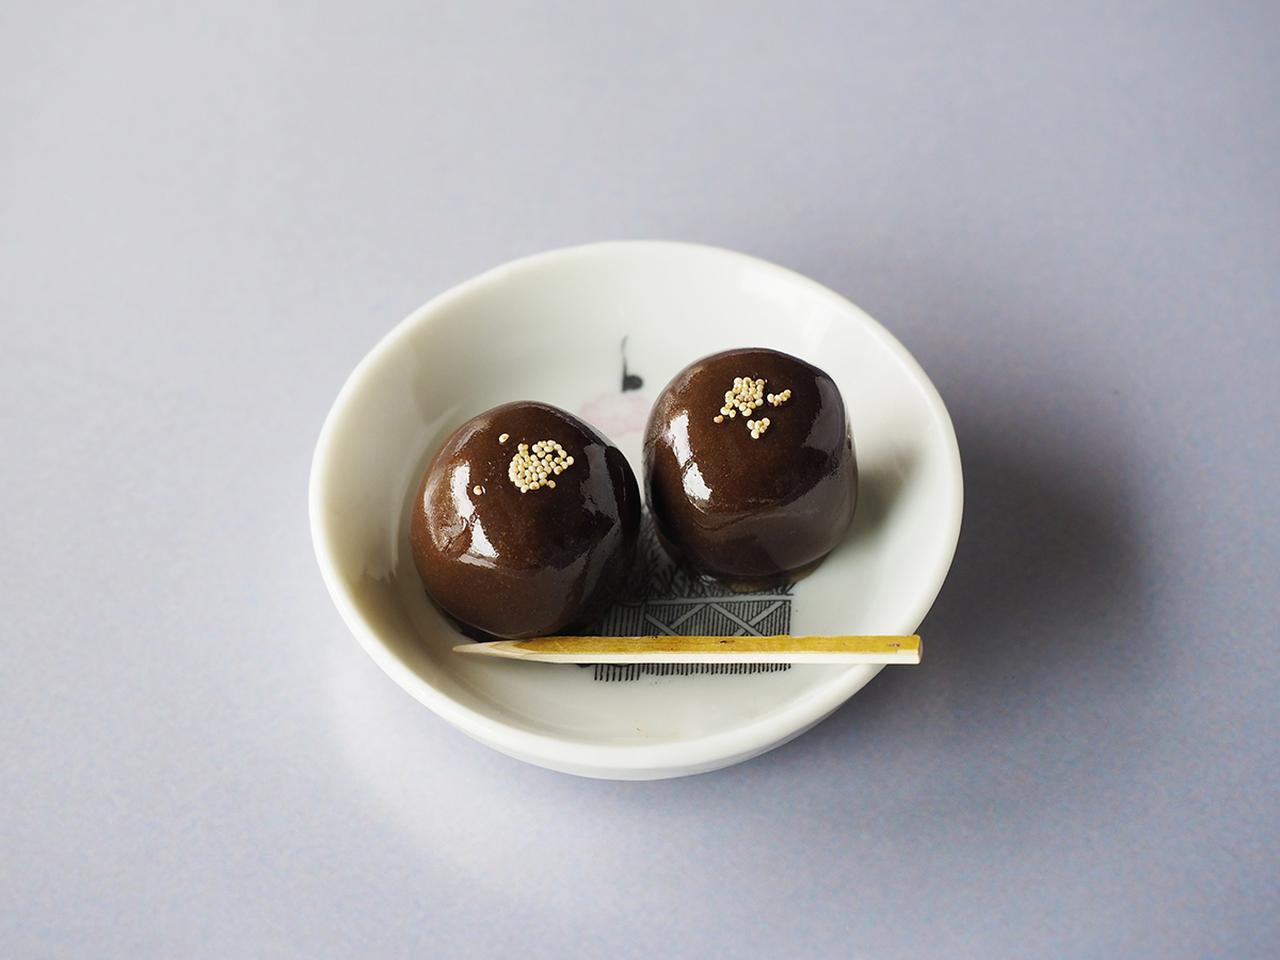 Images : 「烏羽玉」6個入り¥450